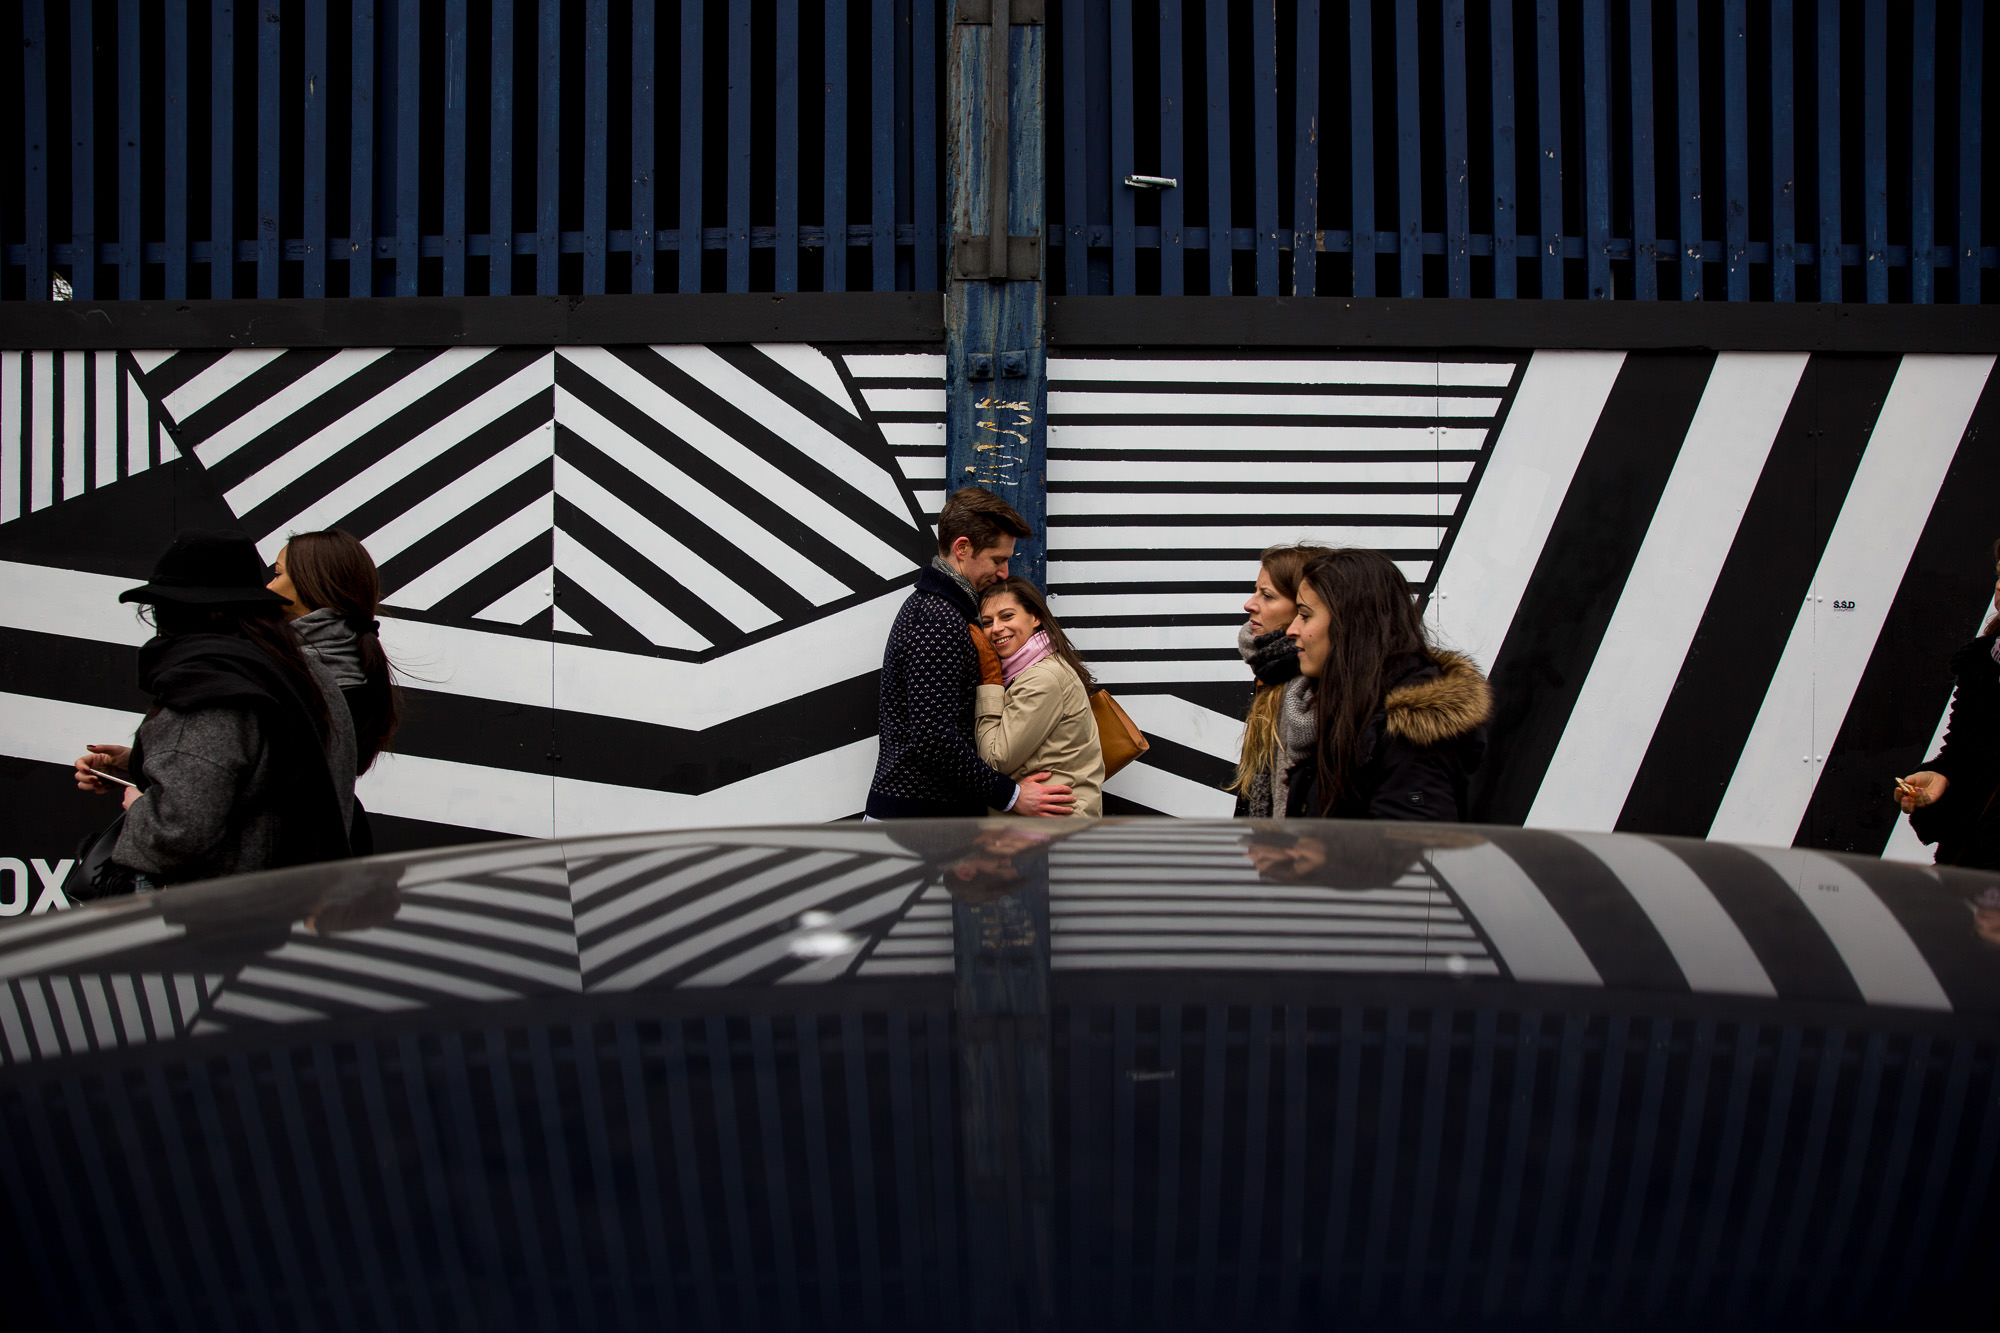 CLAIREBYRNEPHOTOGRAPHY-WEDDING-London-engagment-shoreditch-cute-fun-8.jpg